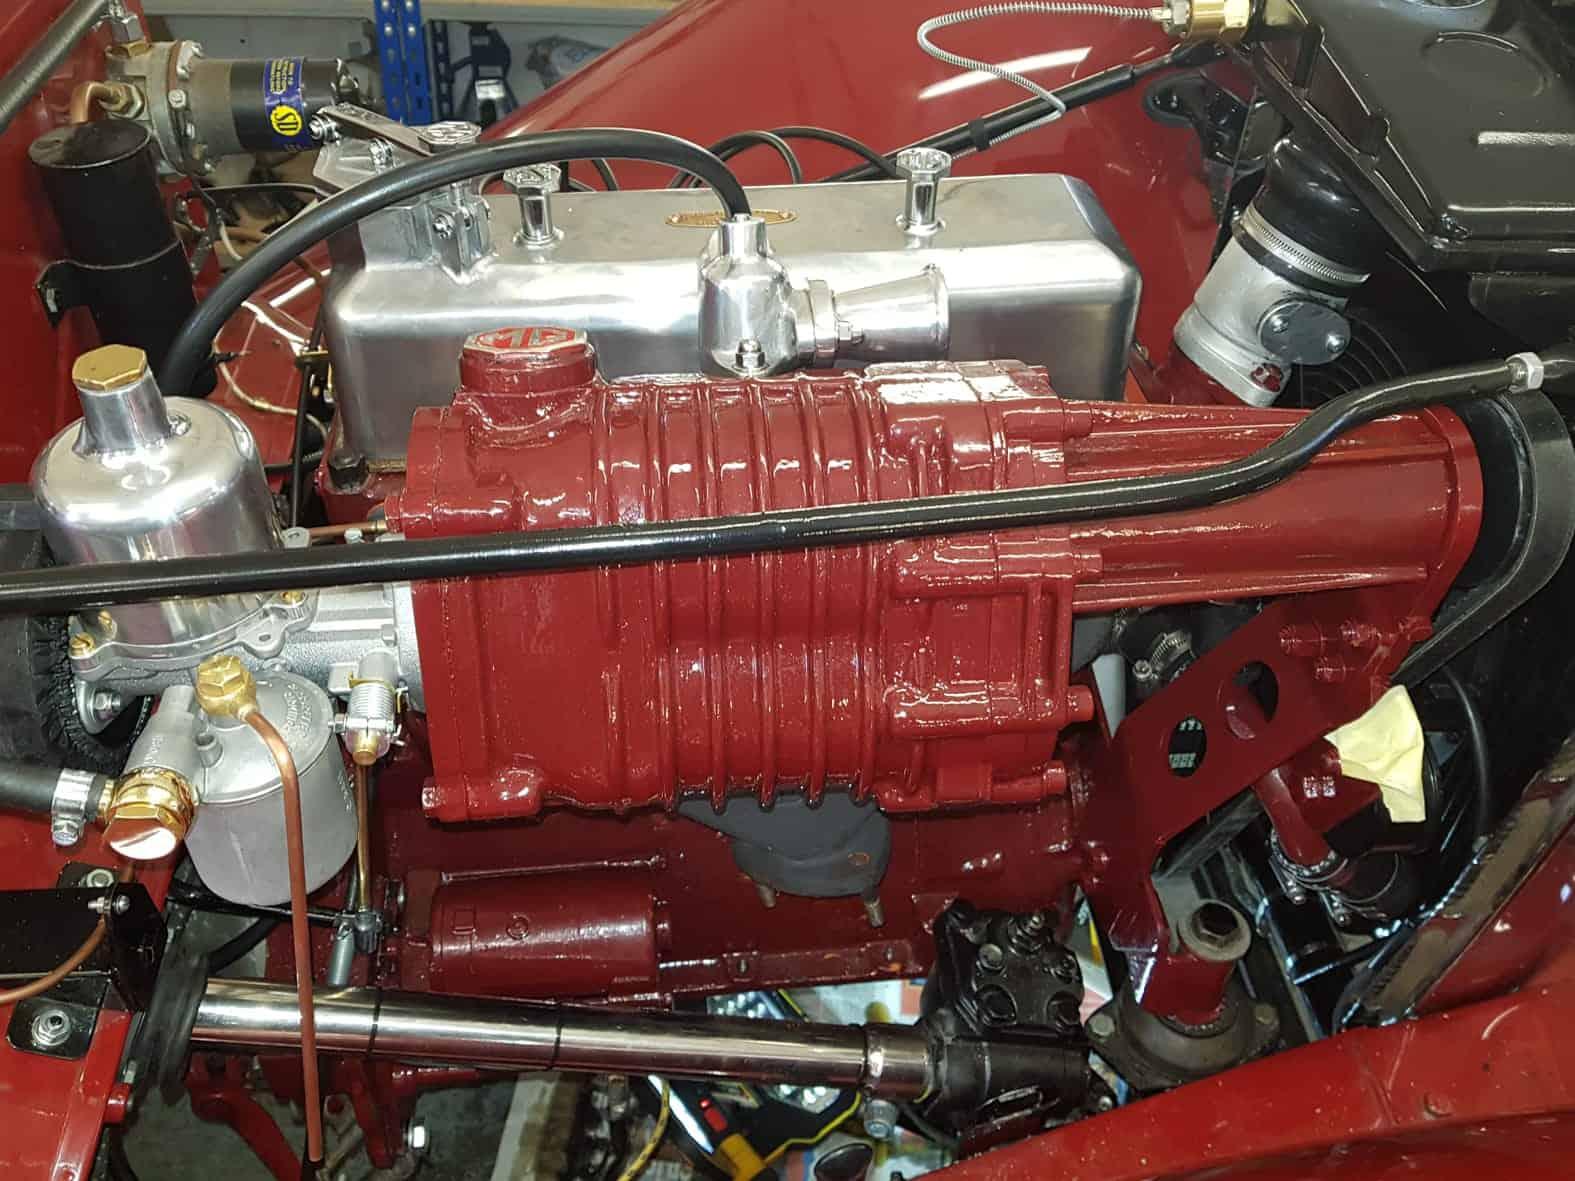 MG TC supercharging engine